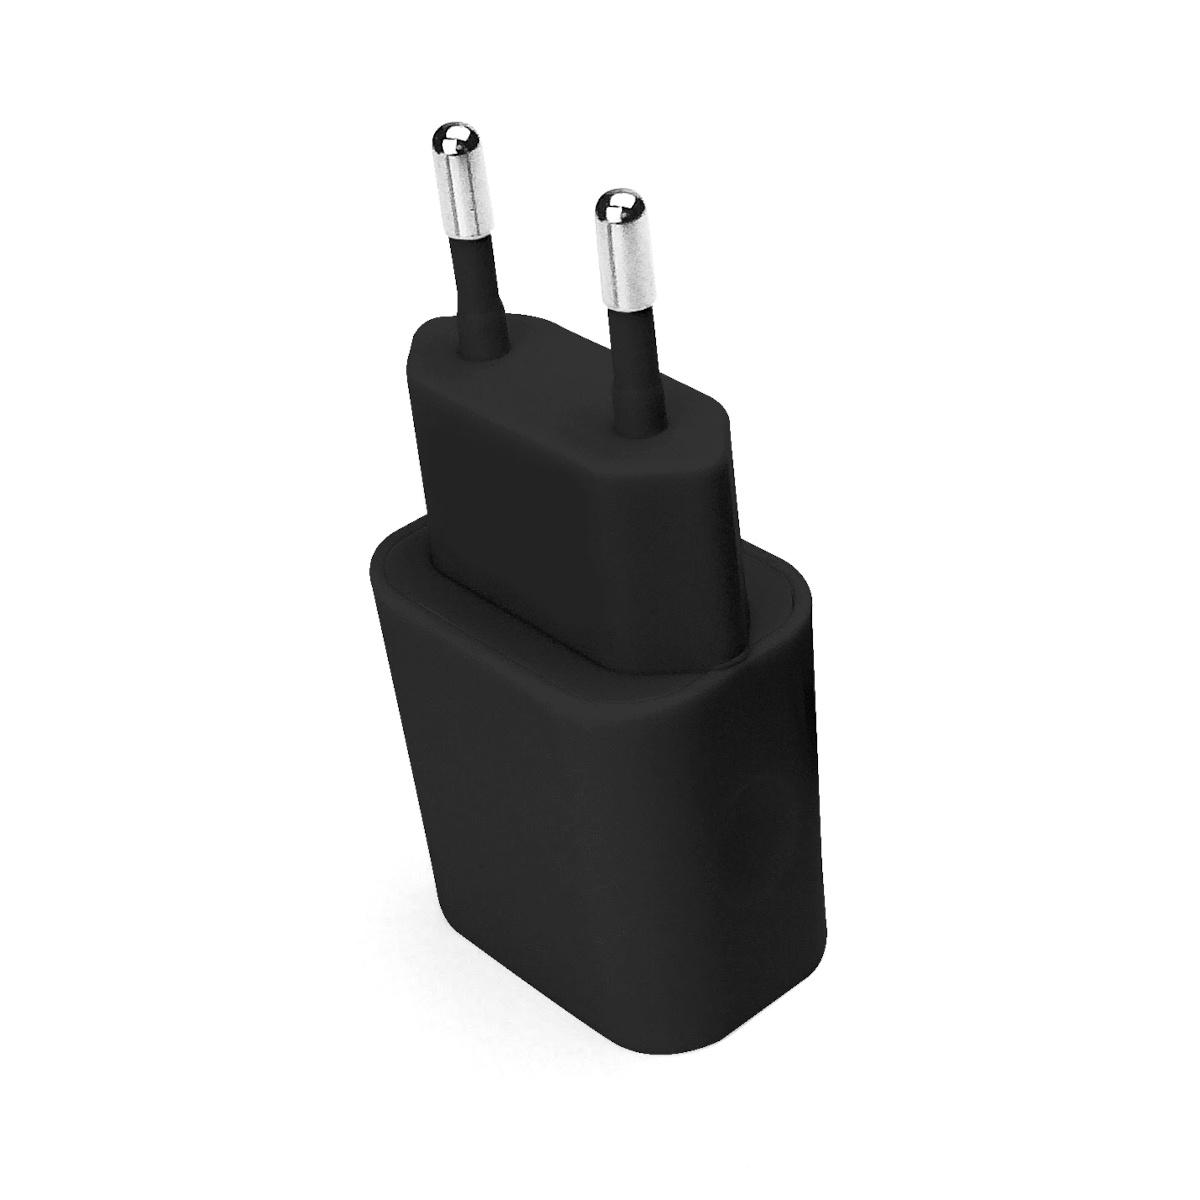 Carregador de parede universal  2 portas USB Preto Geonav